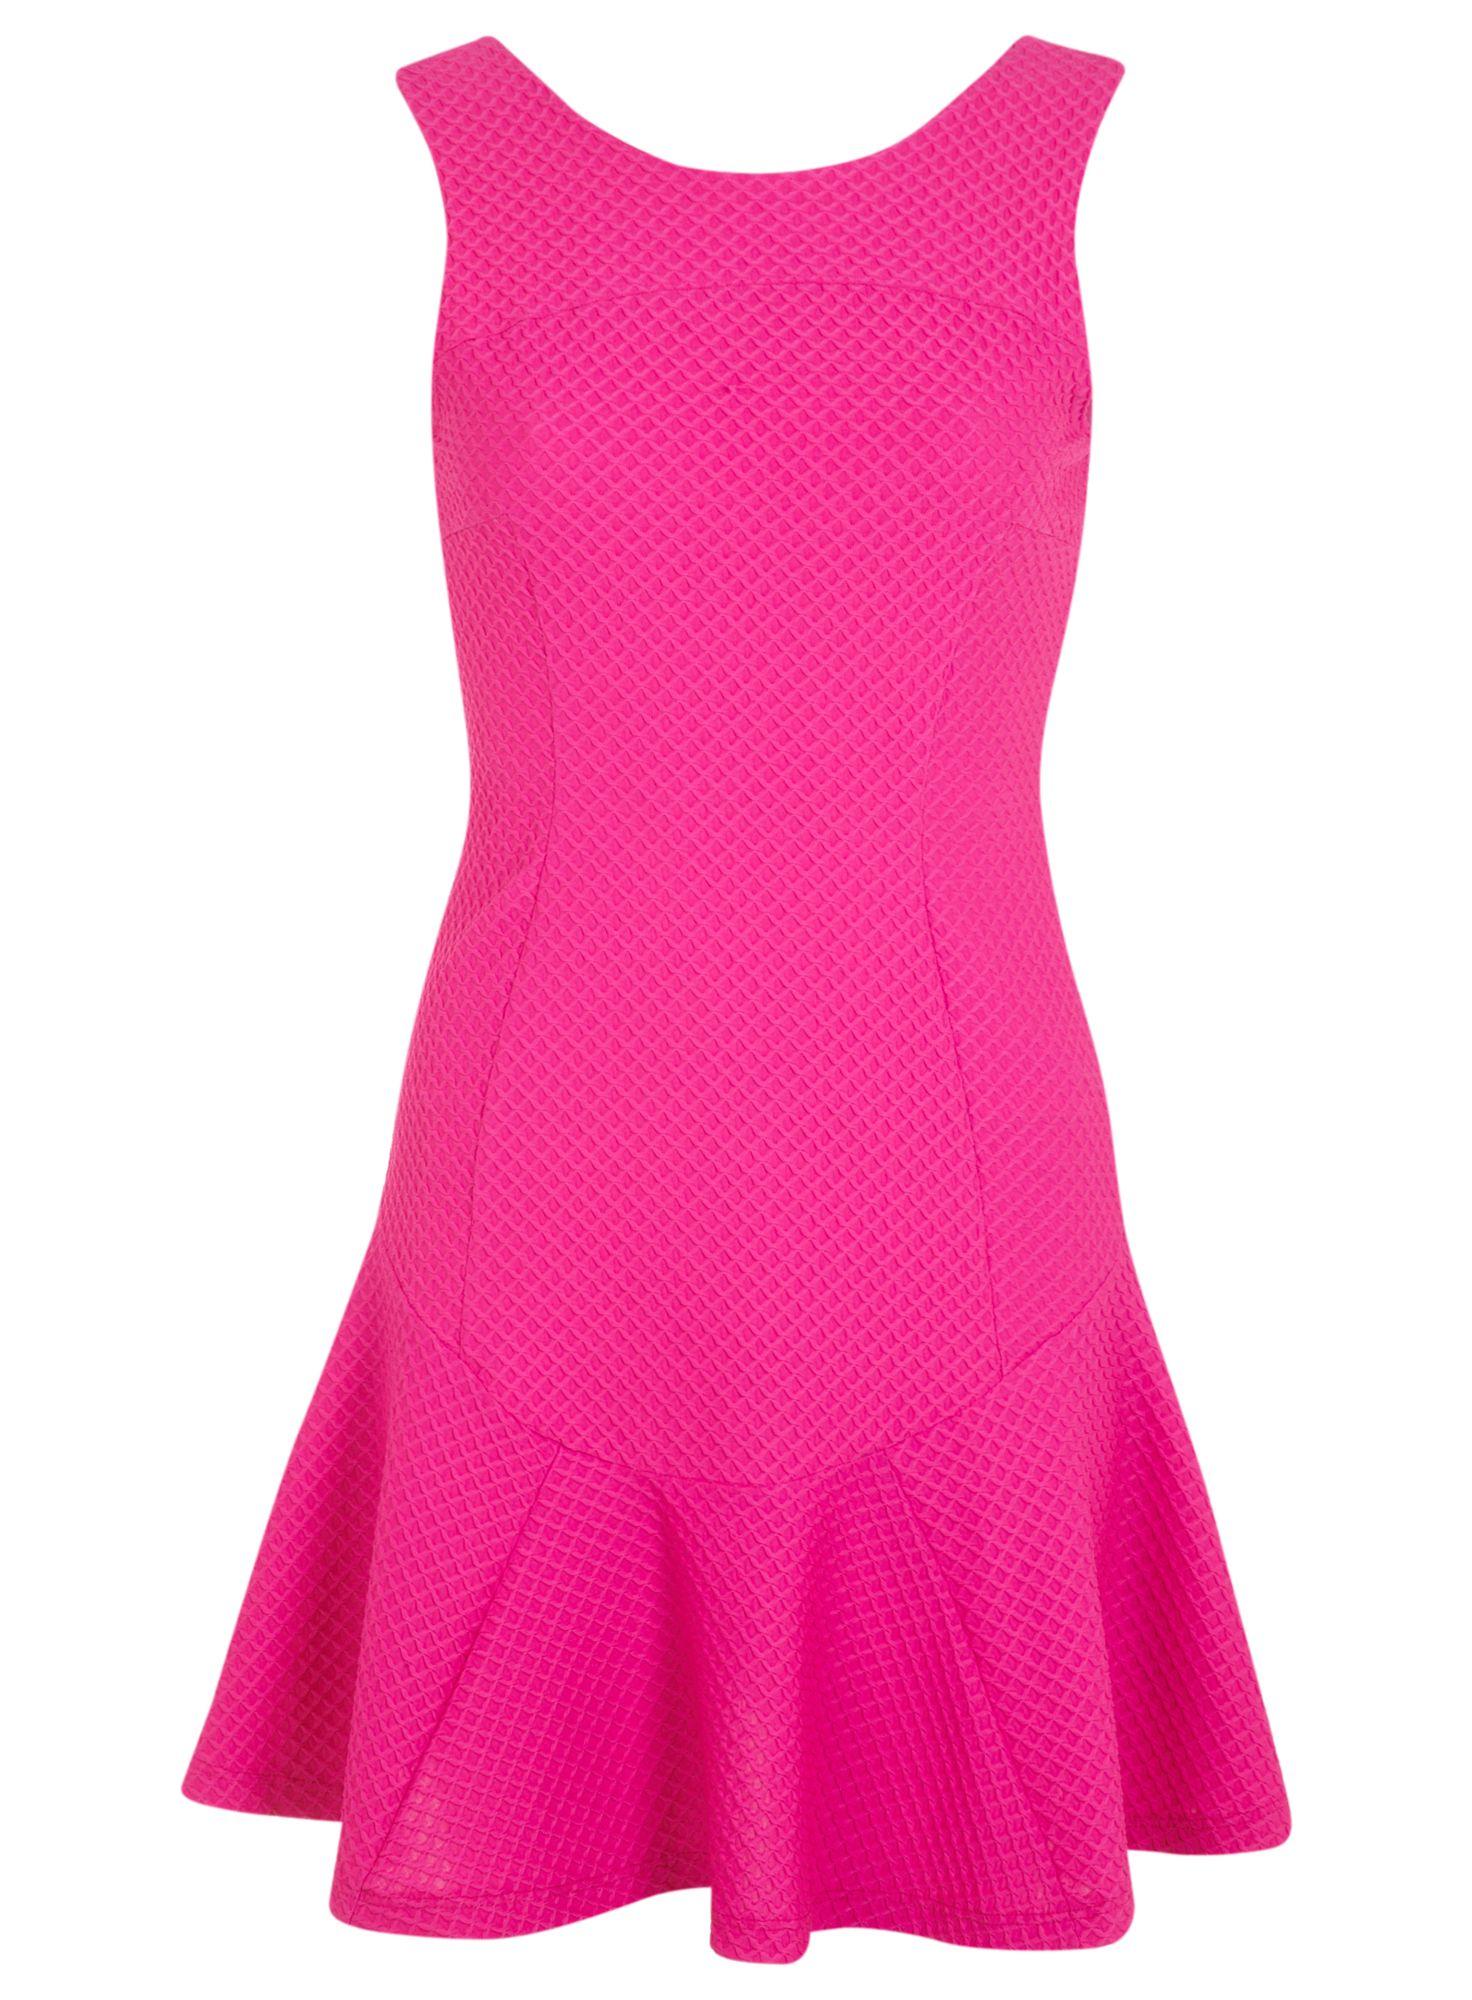 Lyst miss selfridge pink texture trumpet hem dress in pink Pink fashion and style pink dress